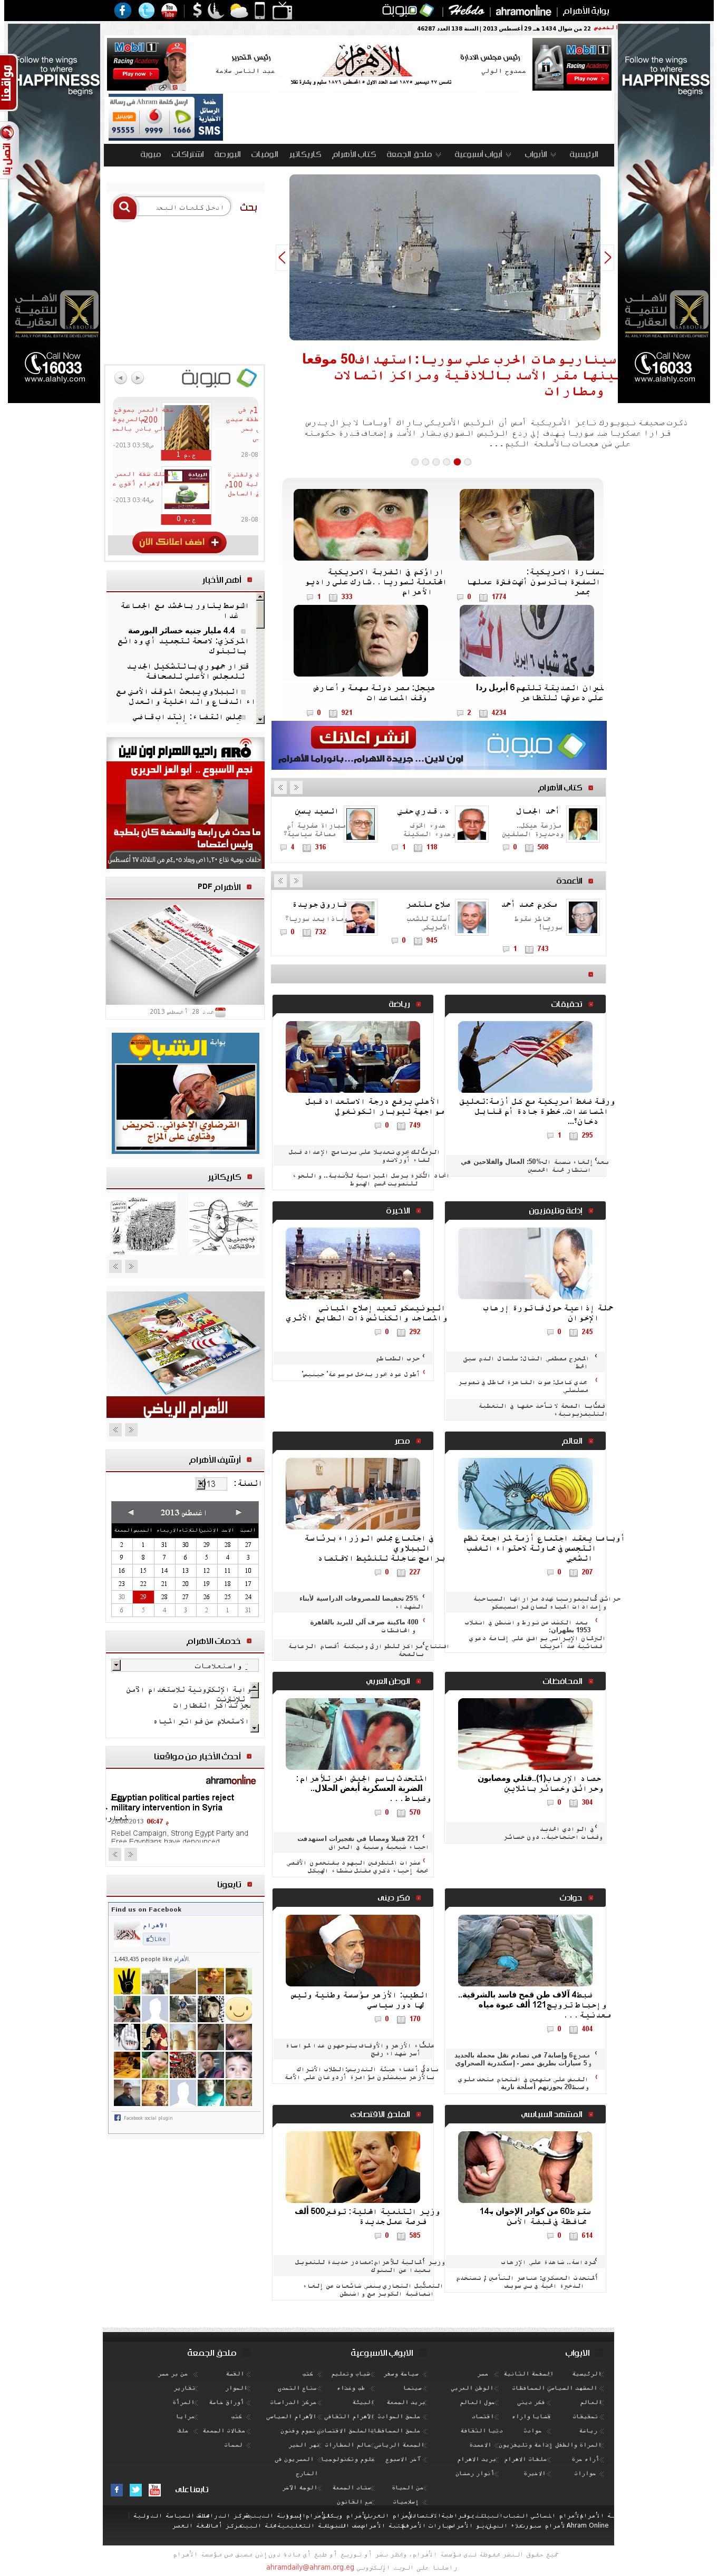 Al-Ahram at Thursday Aug. 29, 2013, 6 a.m. UTC